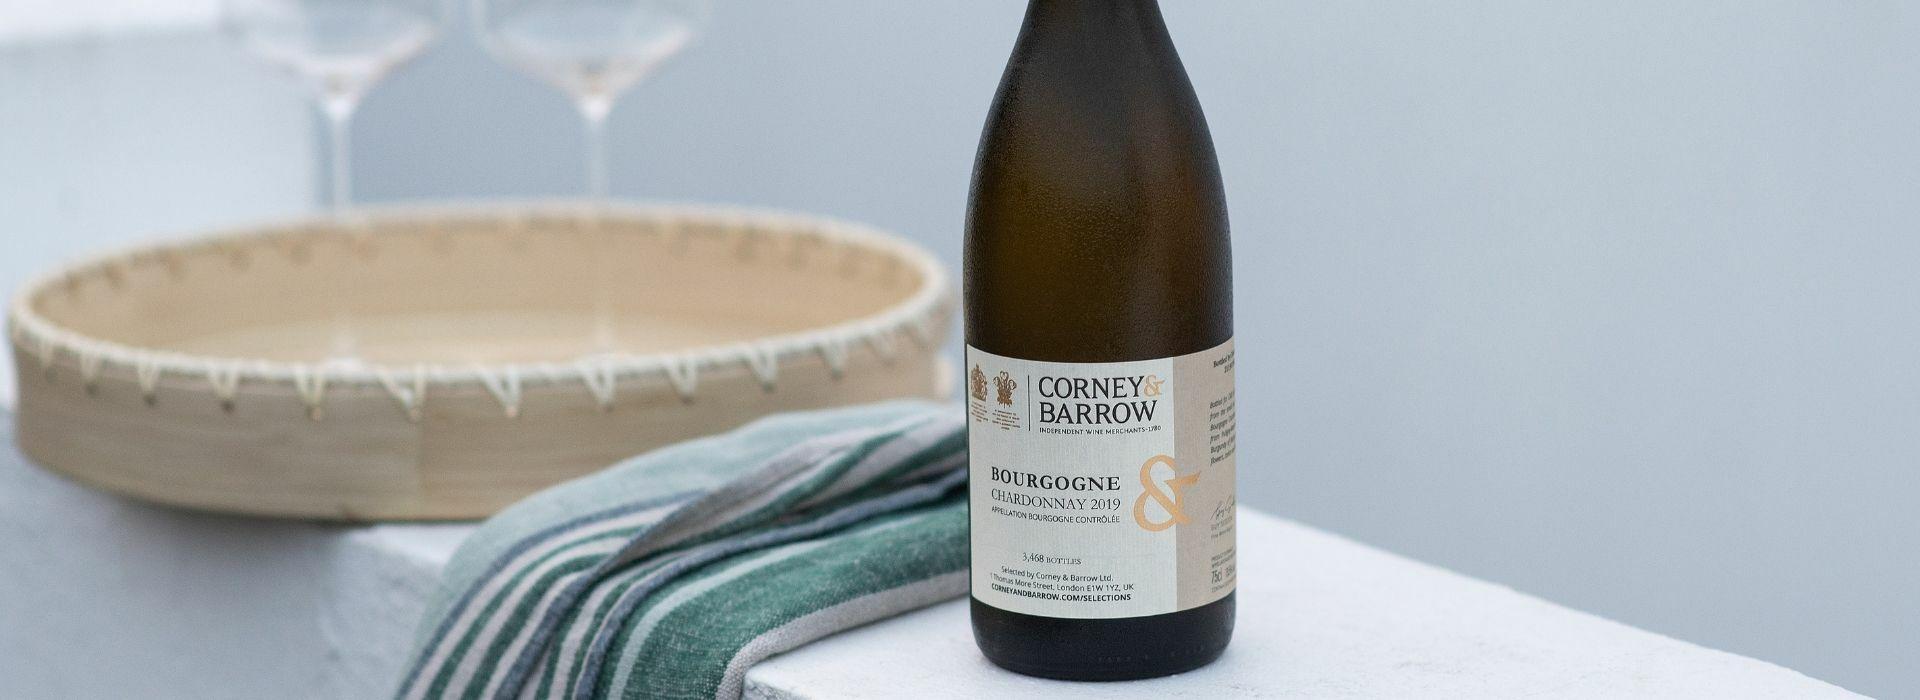 buy bourgogne chardonnay wine